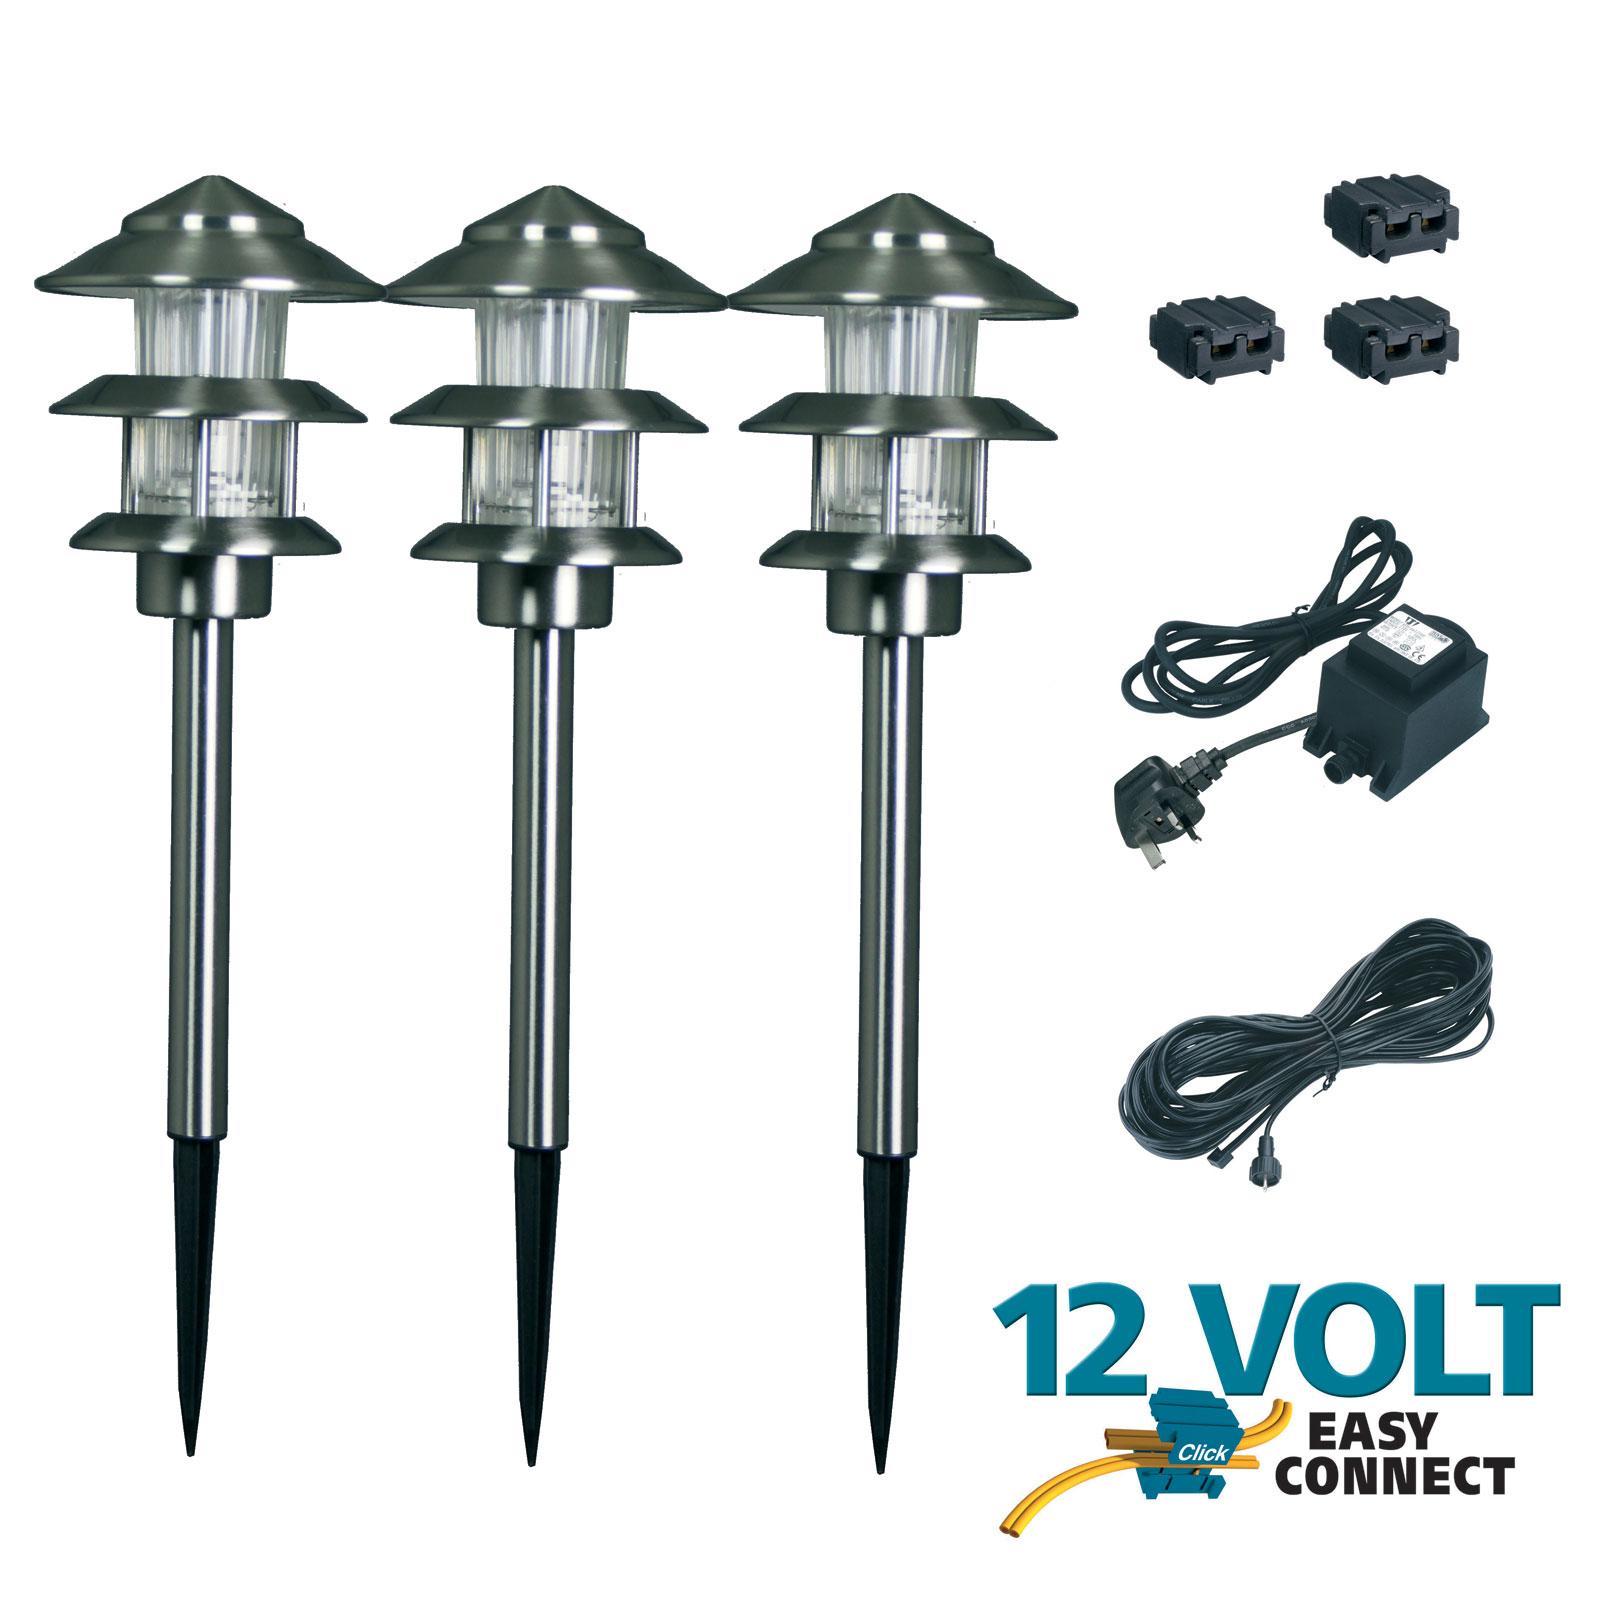 12 volt wiring diagram for garden lights 1997 subaru outback radio 12v electric low voltage post steel set of 3